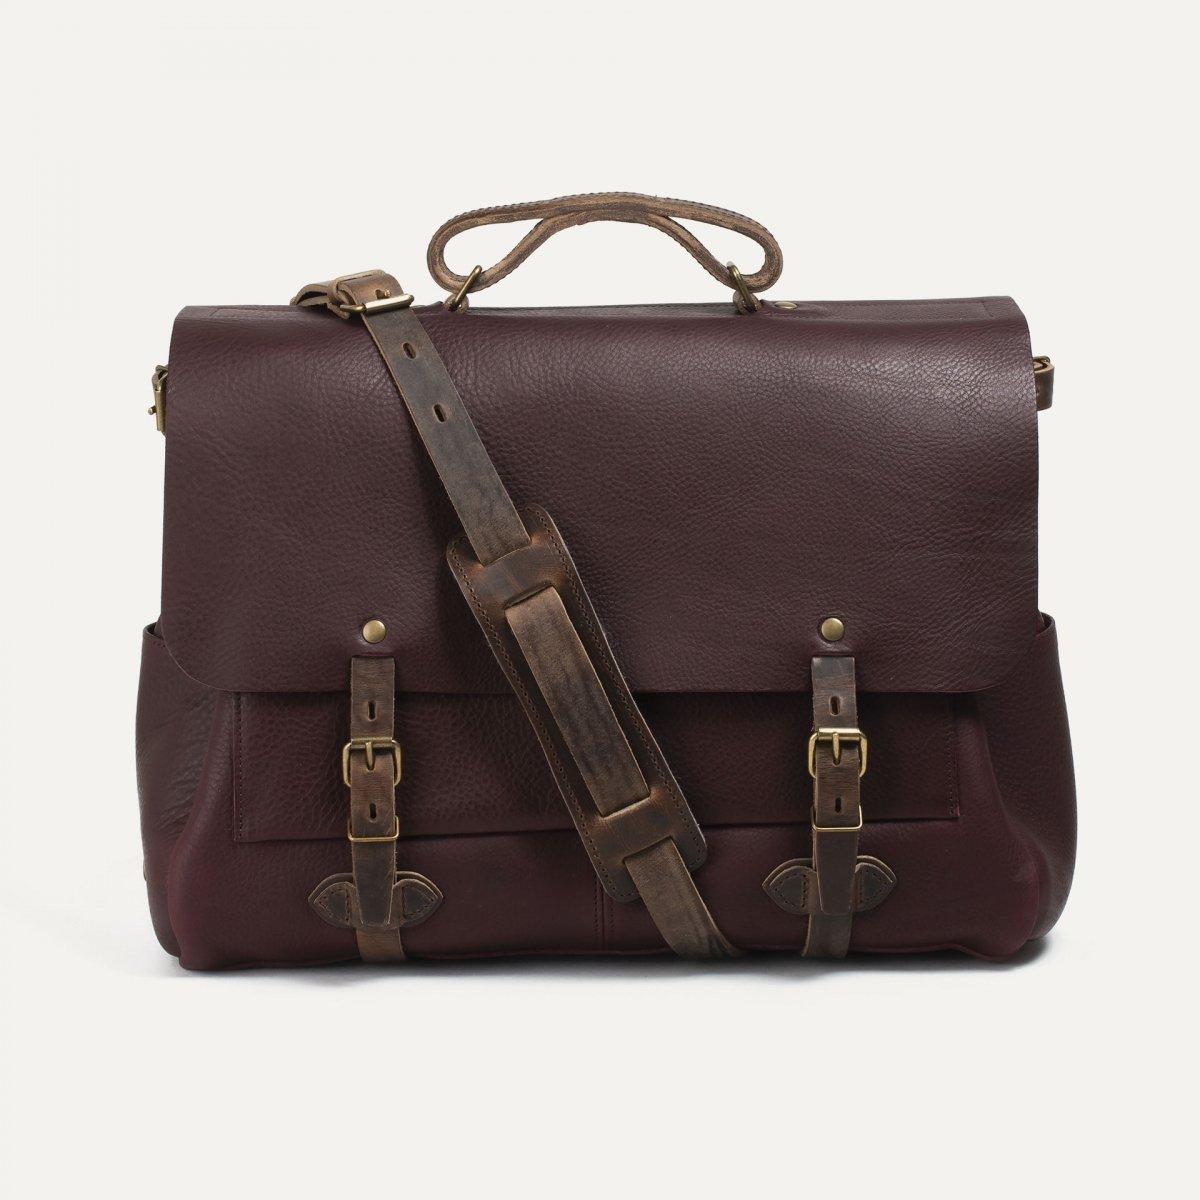 48h Irving Executive Postman bag - Peat (image n°1)